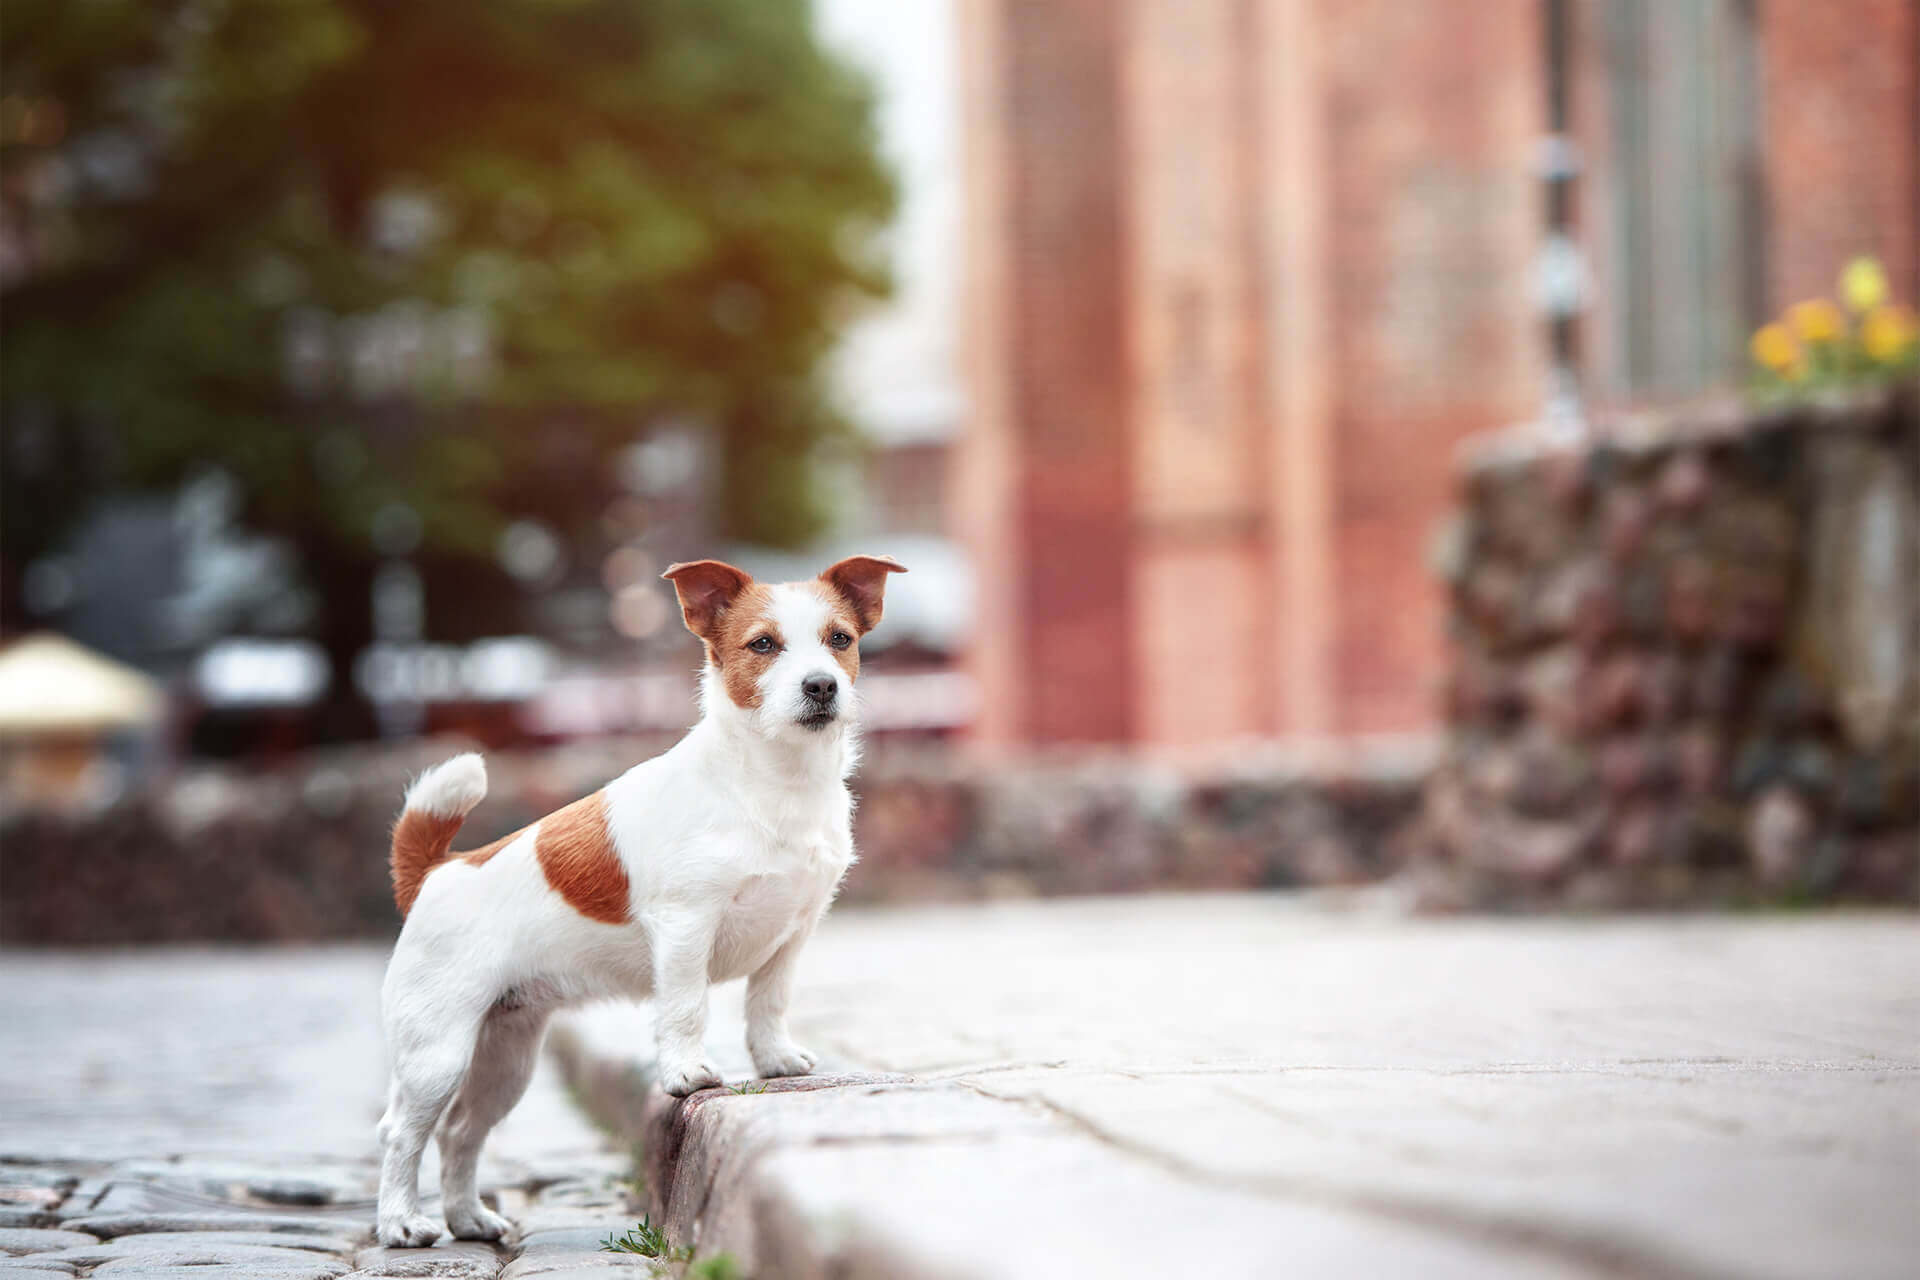 Hund veschwunden Bielefeld